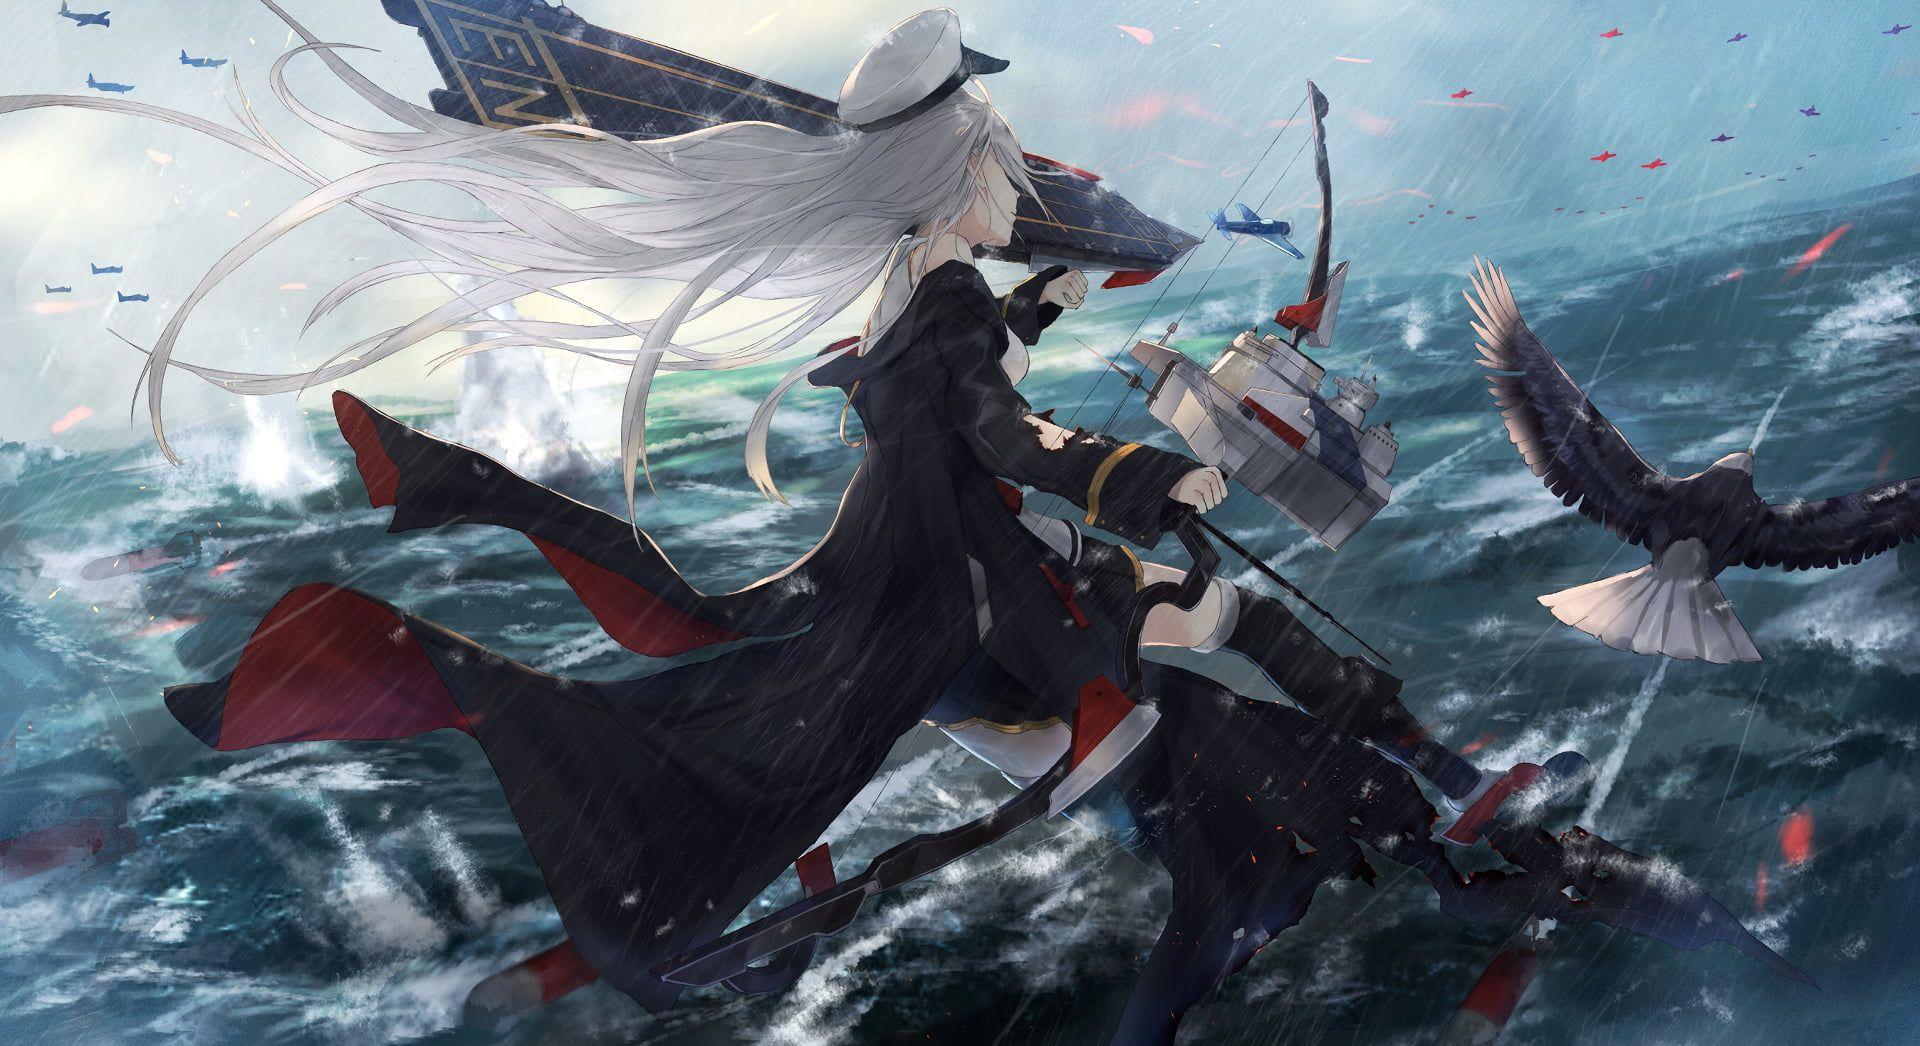 digital art artwork video games Azur Lane white hair